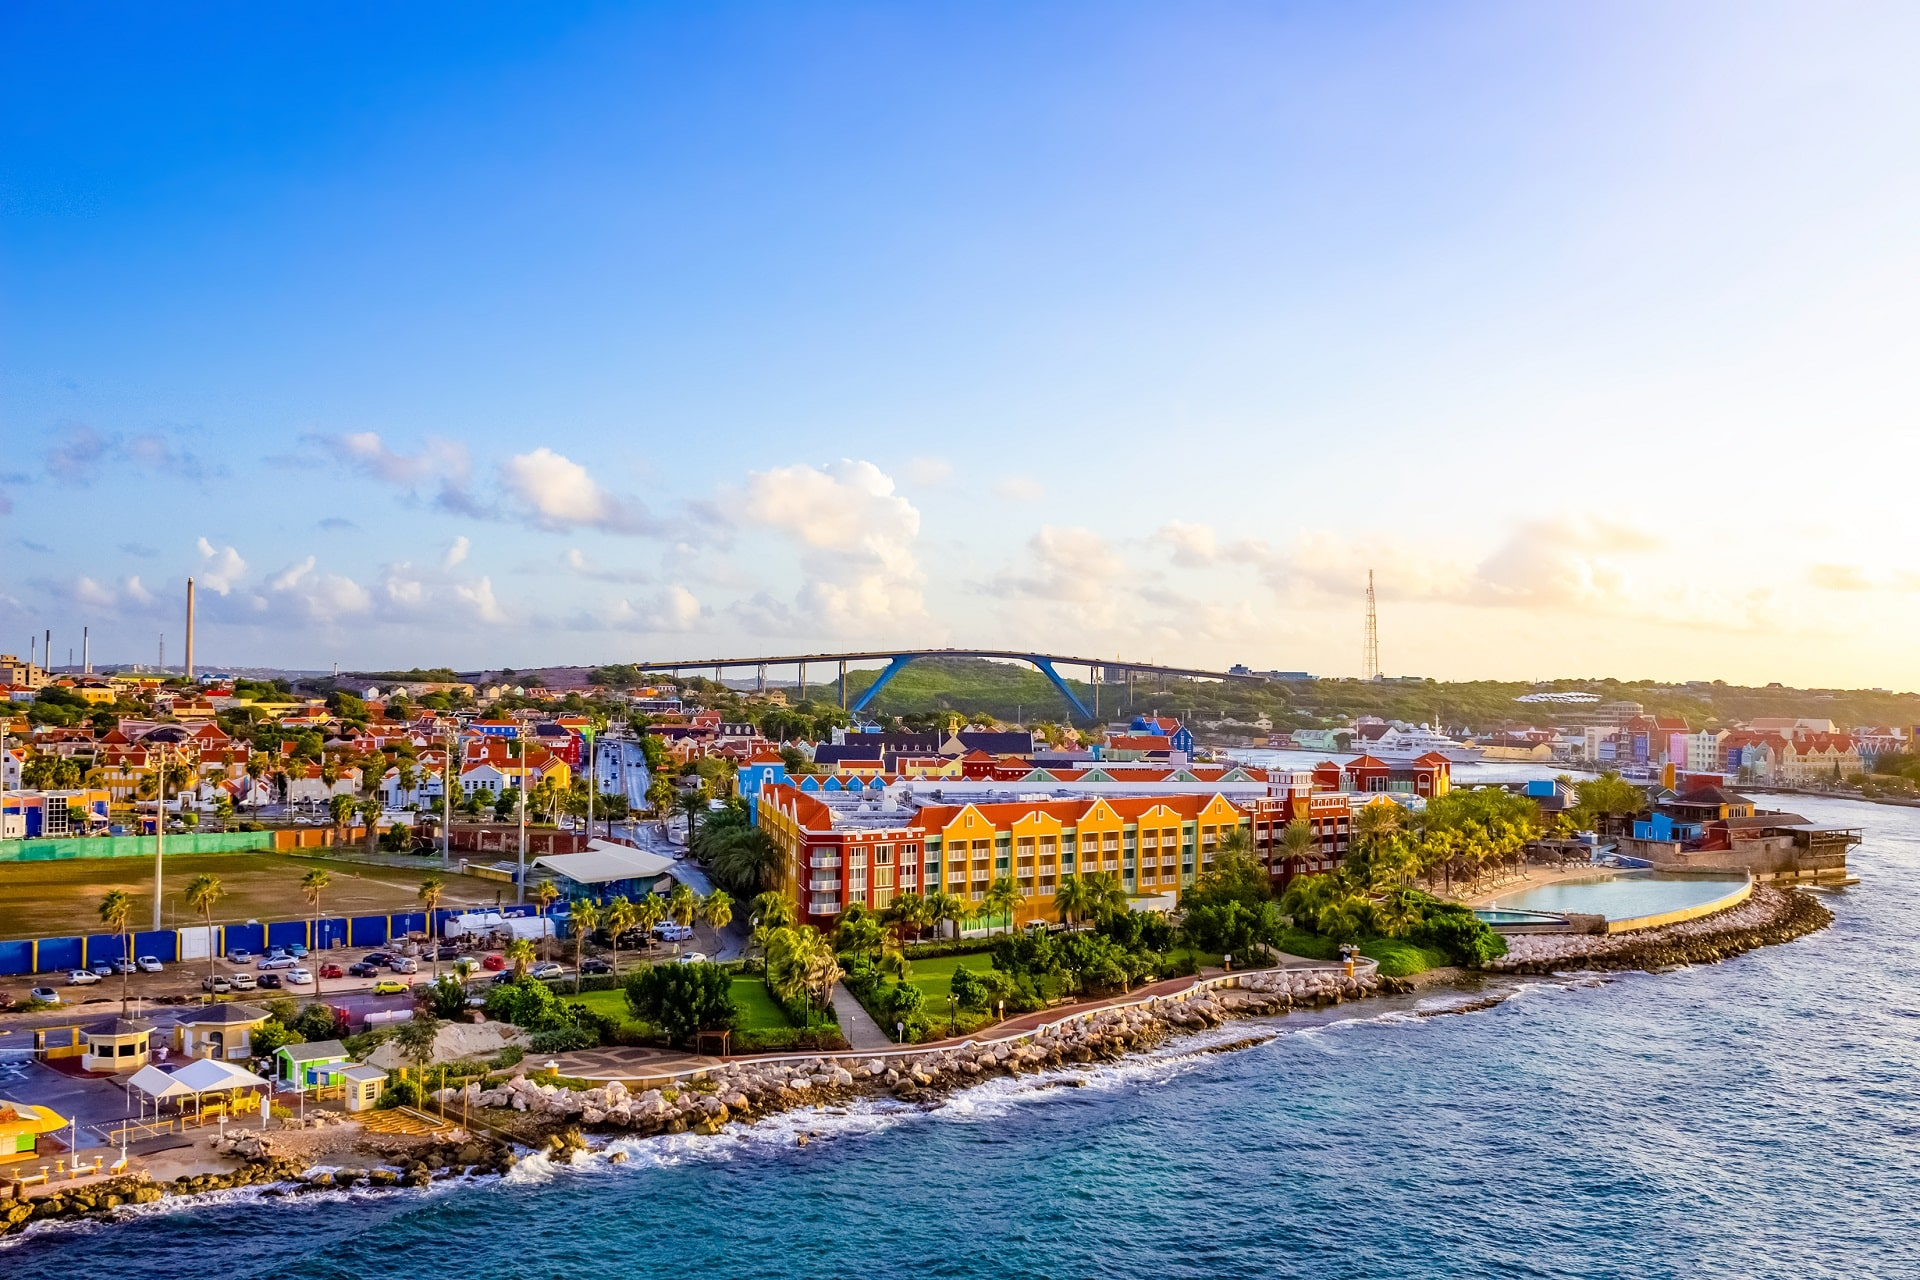 Willemstad-Curacao3